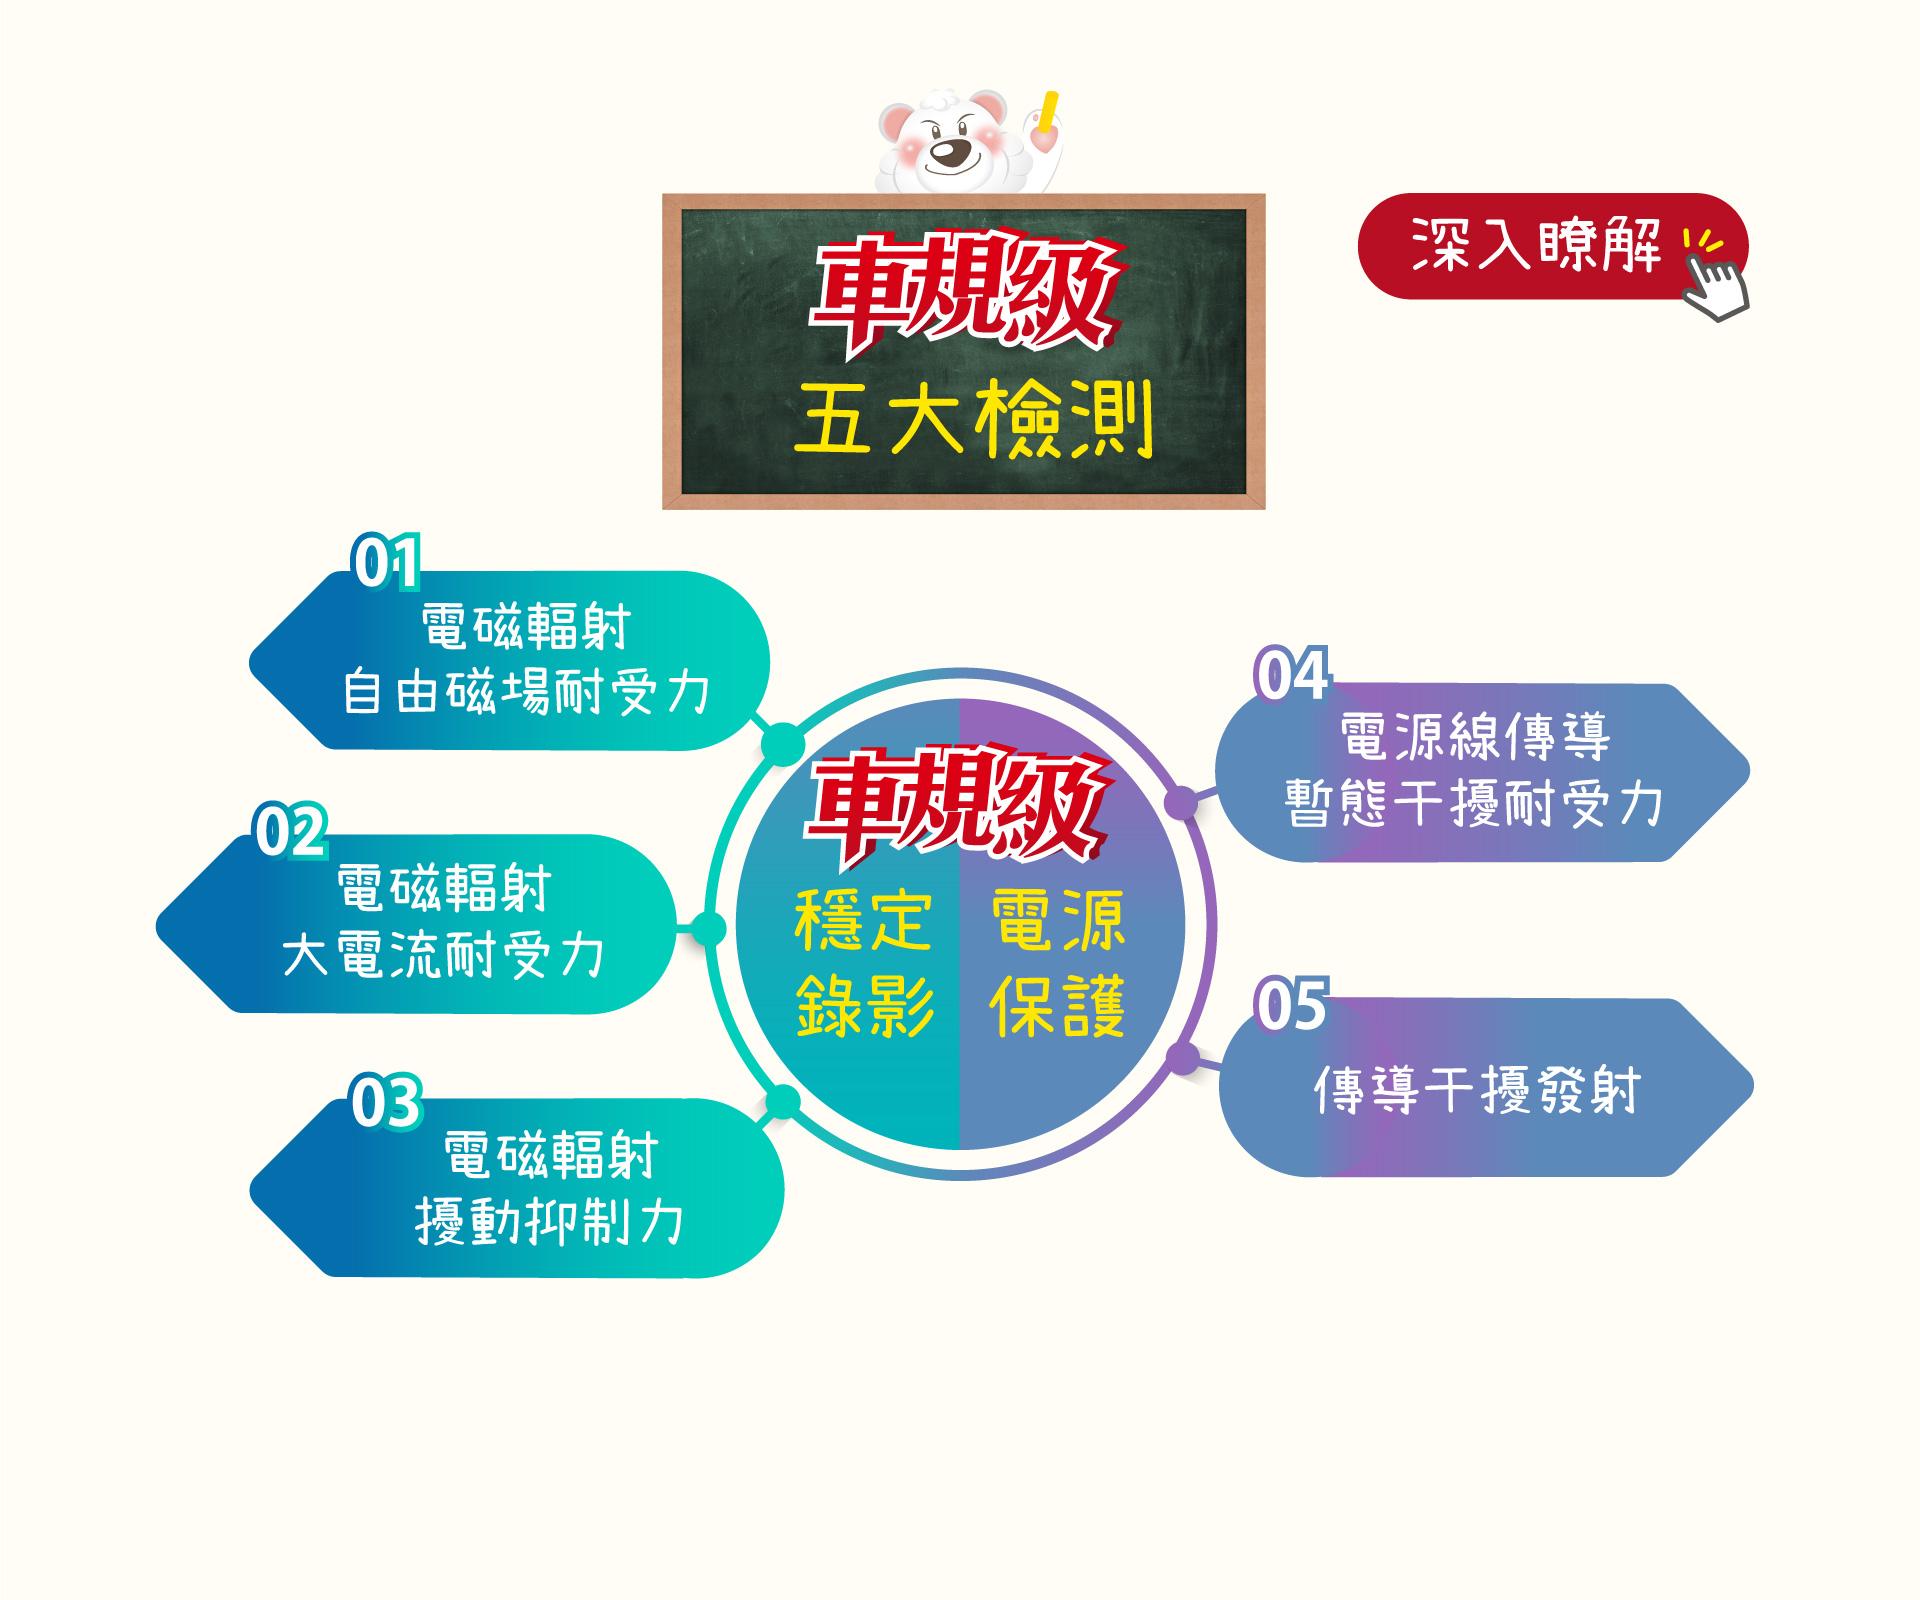 proimages/product/Bike_Cam/PX-GX1_Plus/GX1_lesson-link.jpg